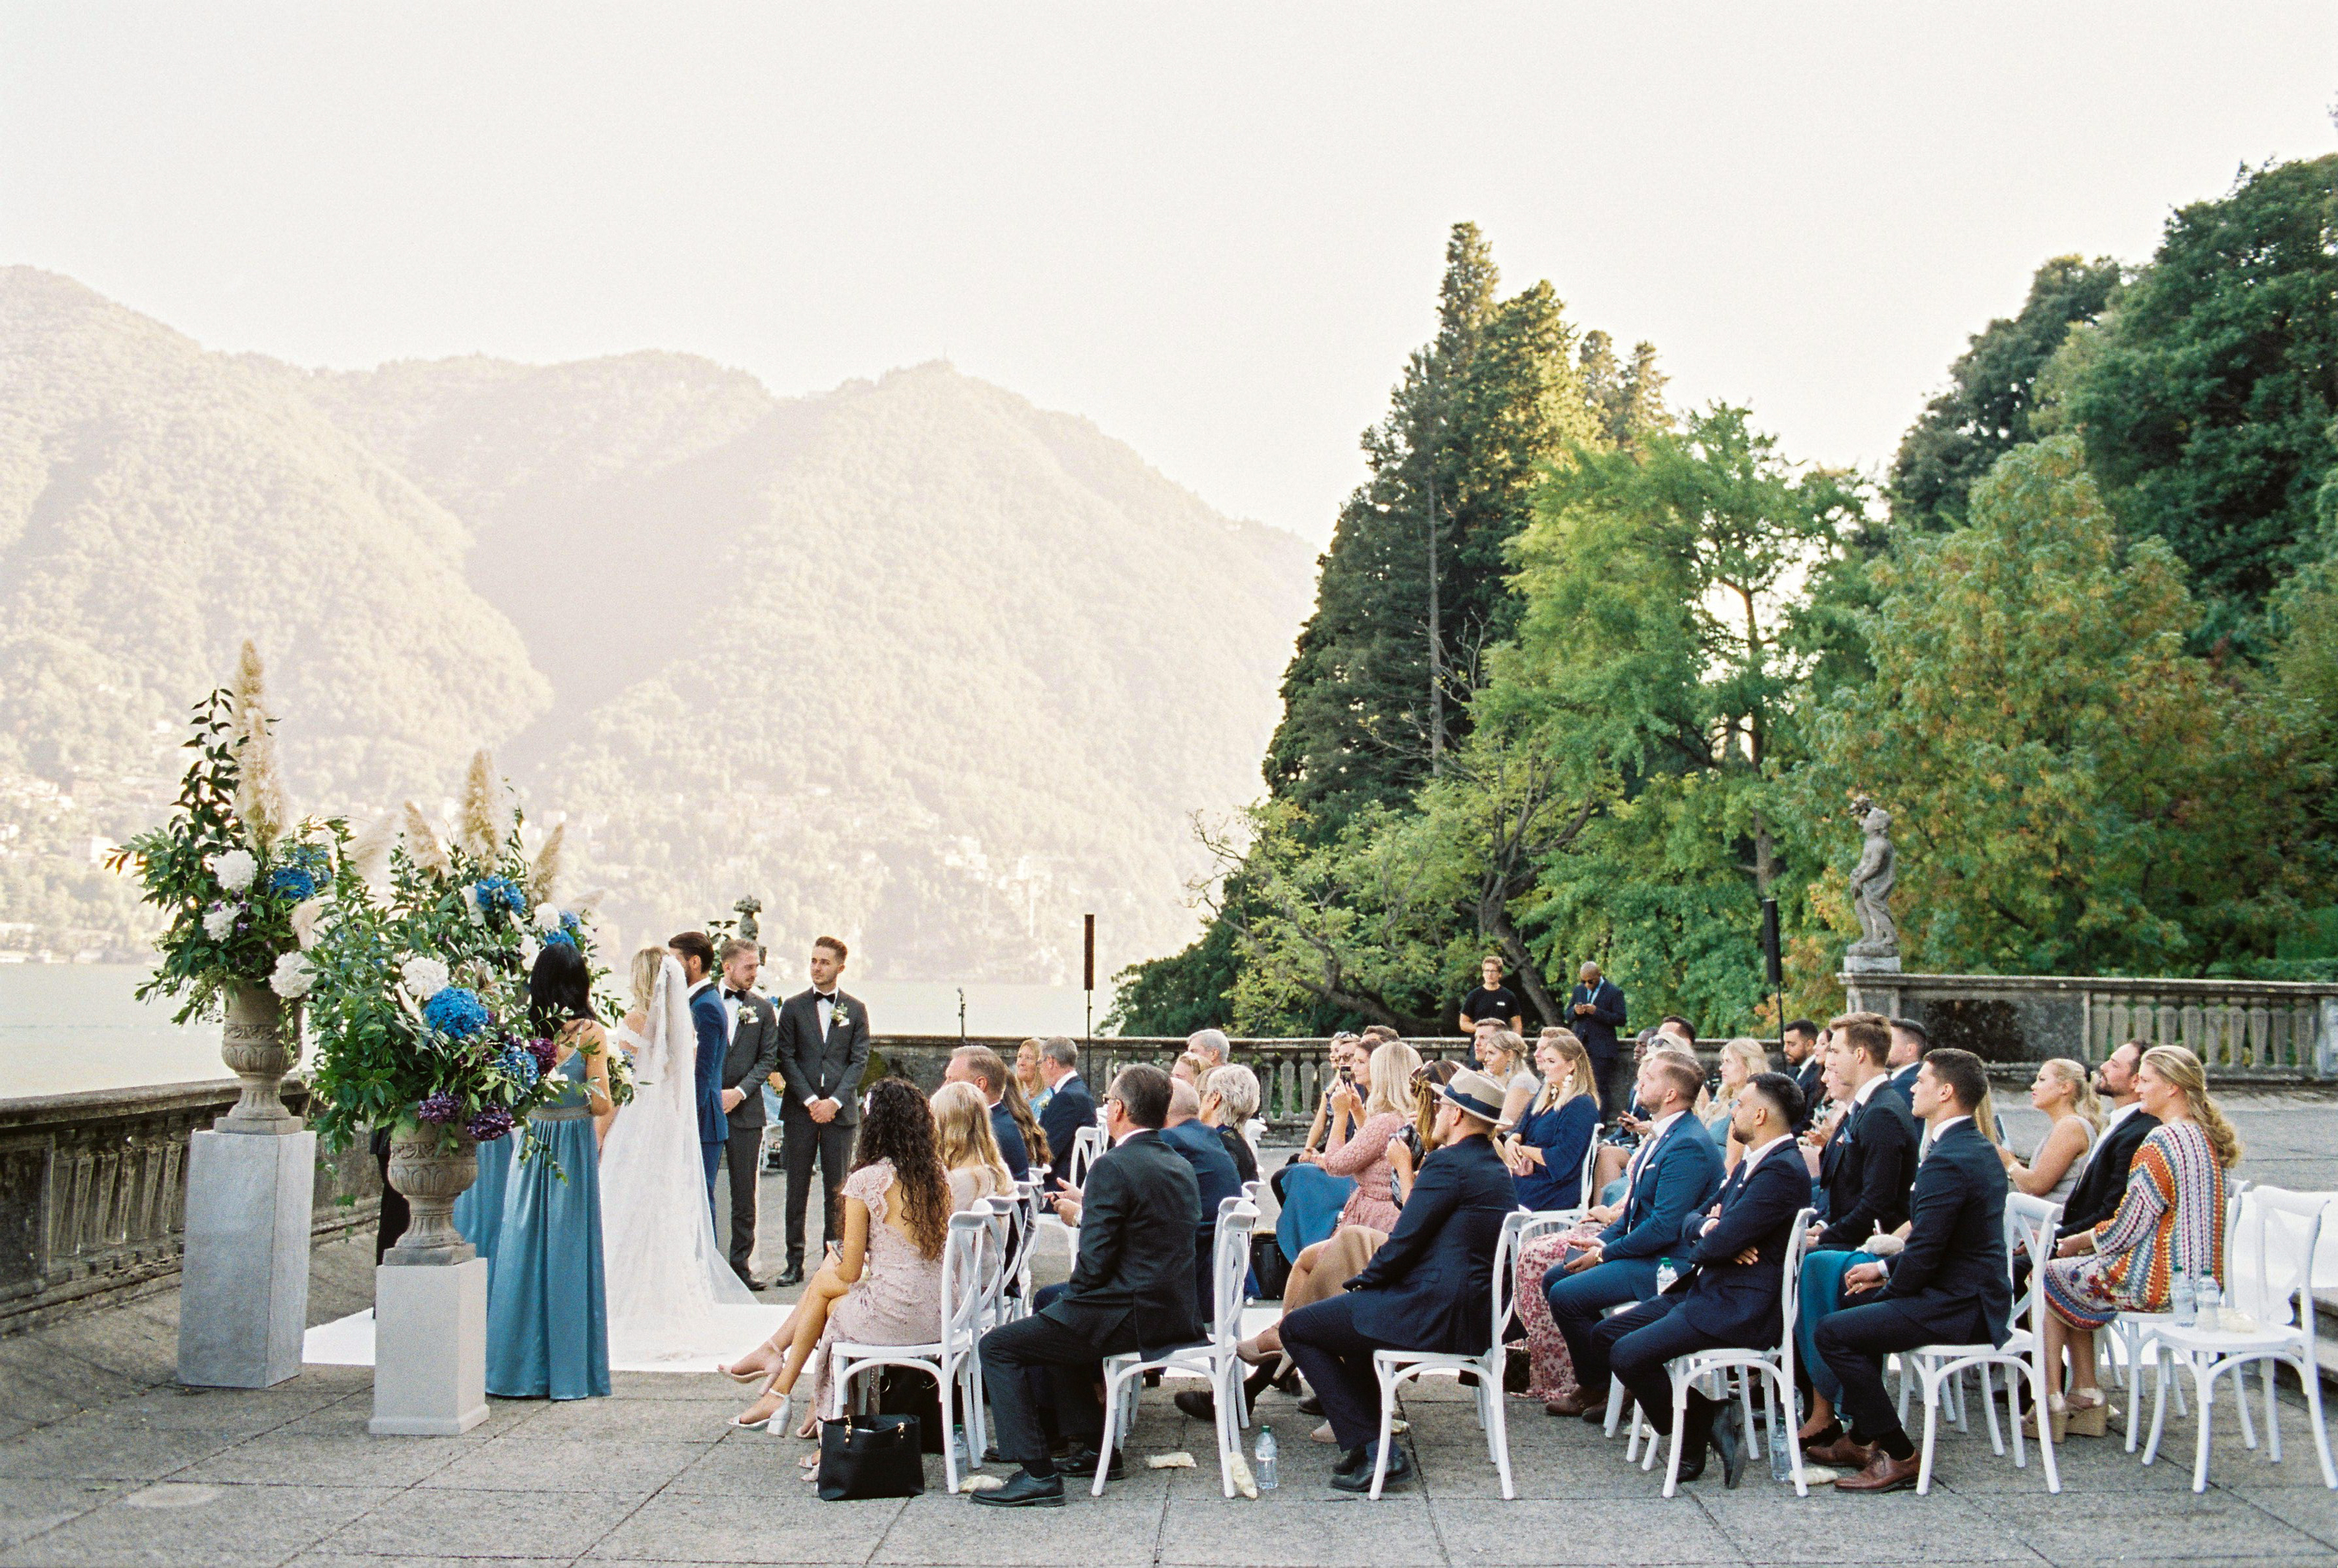 2 BridesPhotography_Molimenti_Wedding_33